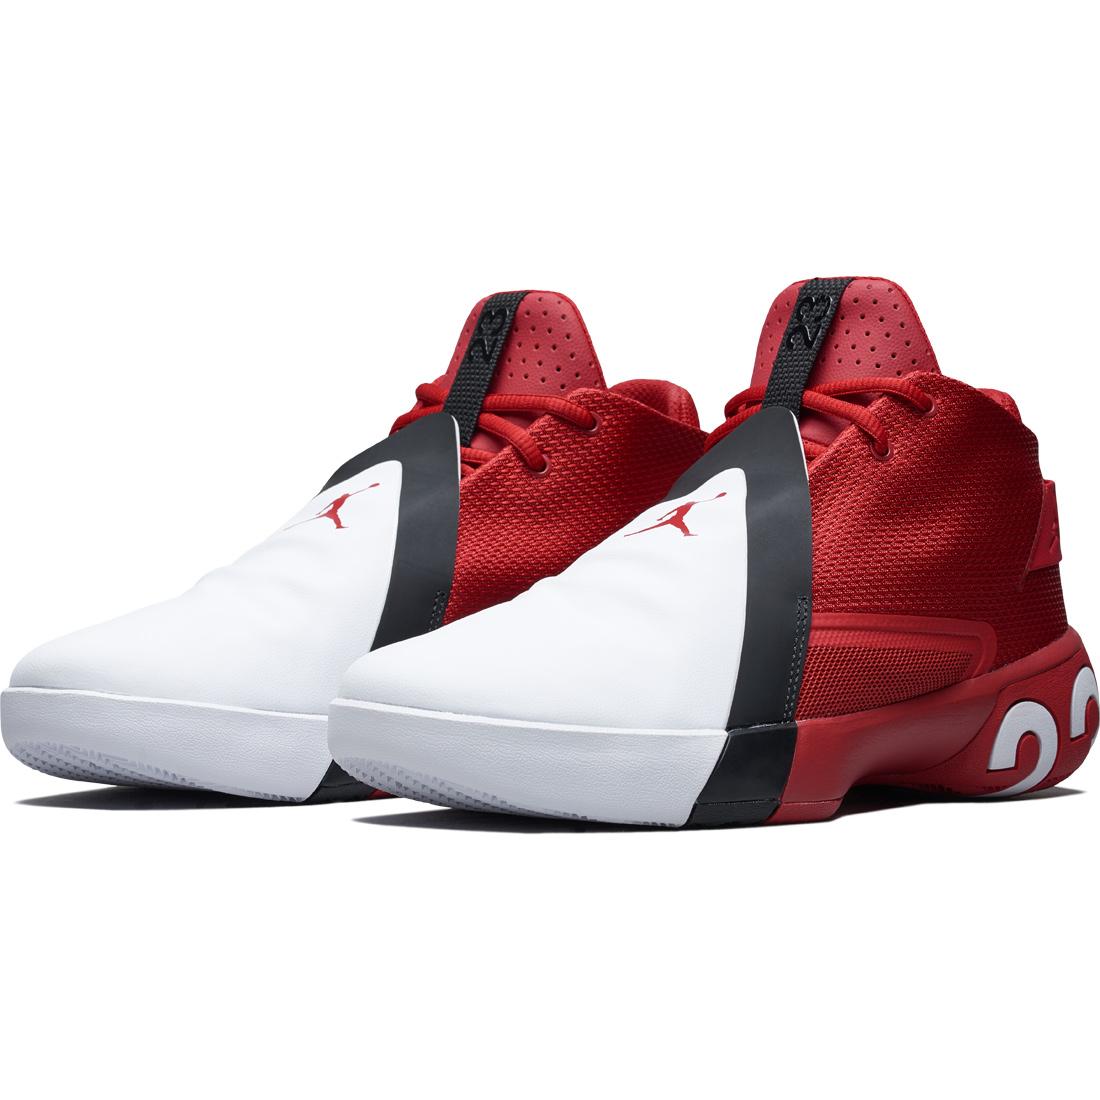 buy popular e965a c1ef5 Nike Jordan Ultra Fly 3 Basketball Sneaker rot weiß AR0044 601 – Bild 3